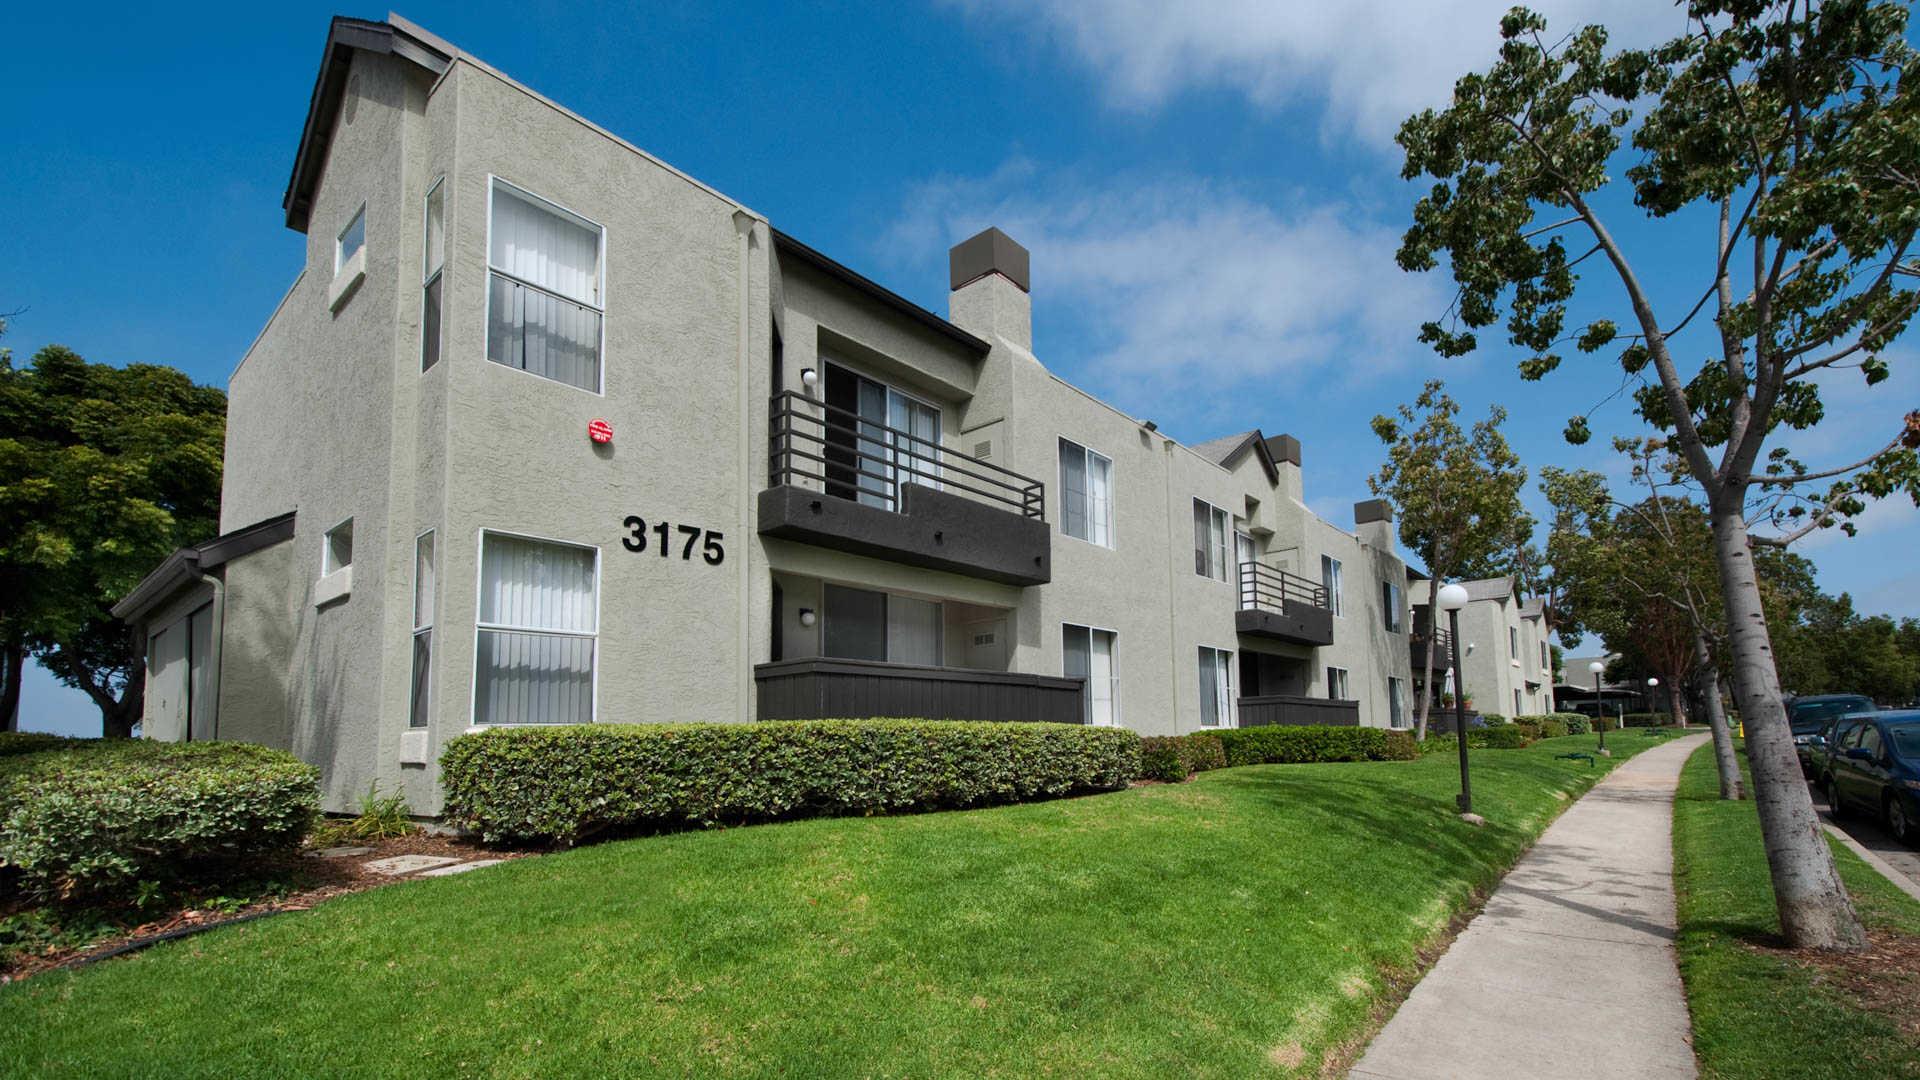 Canyon Ridge Corporate Rental-Sample Image of San Diego CA Temporary Home